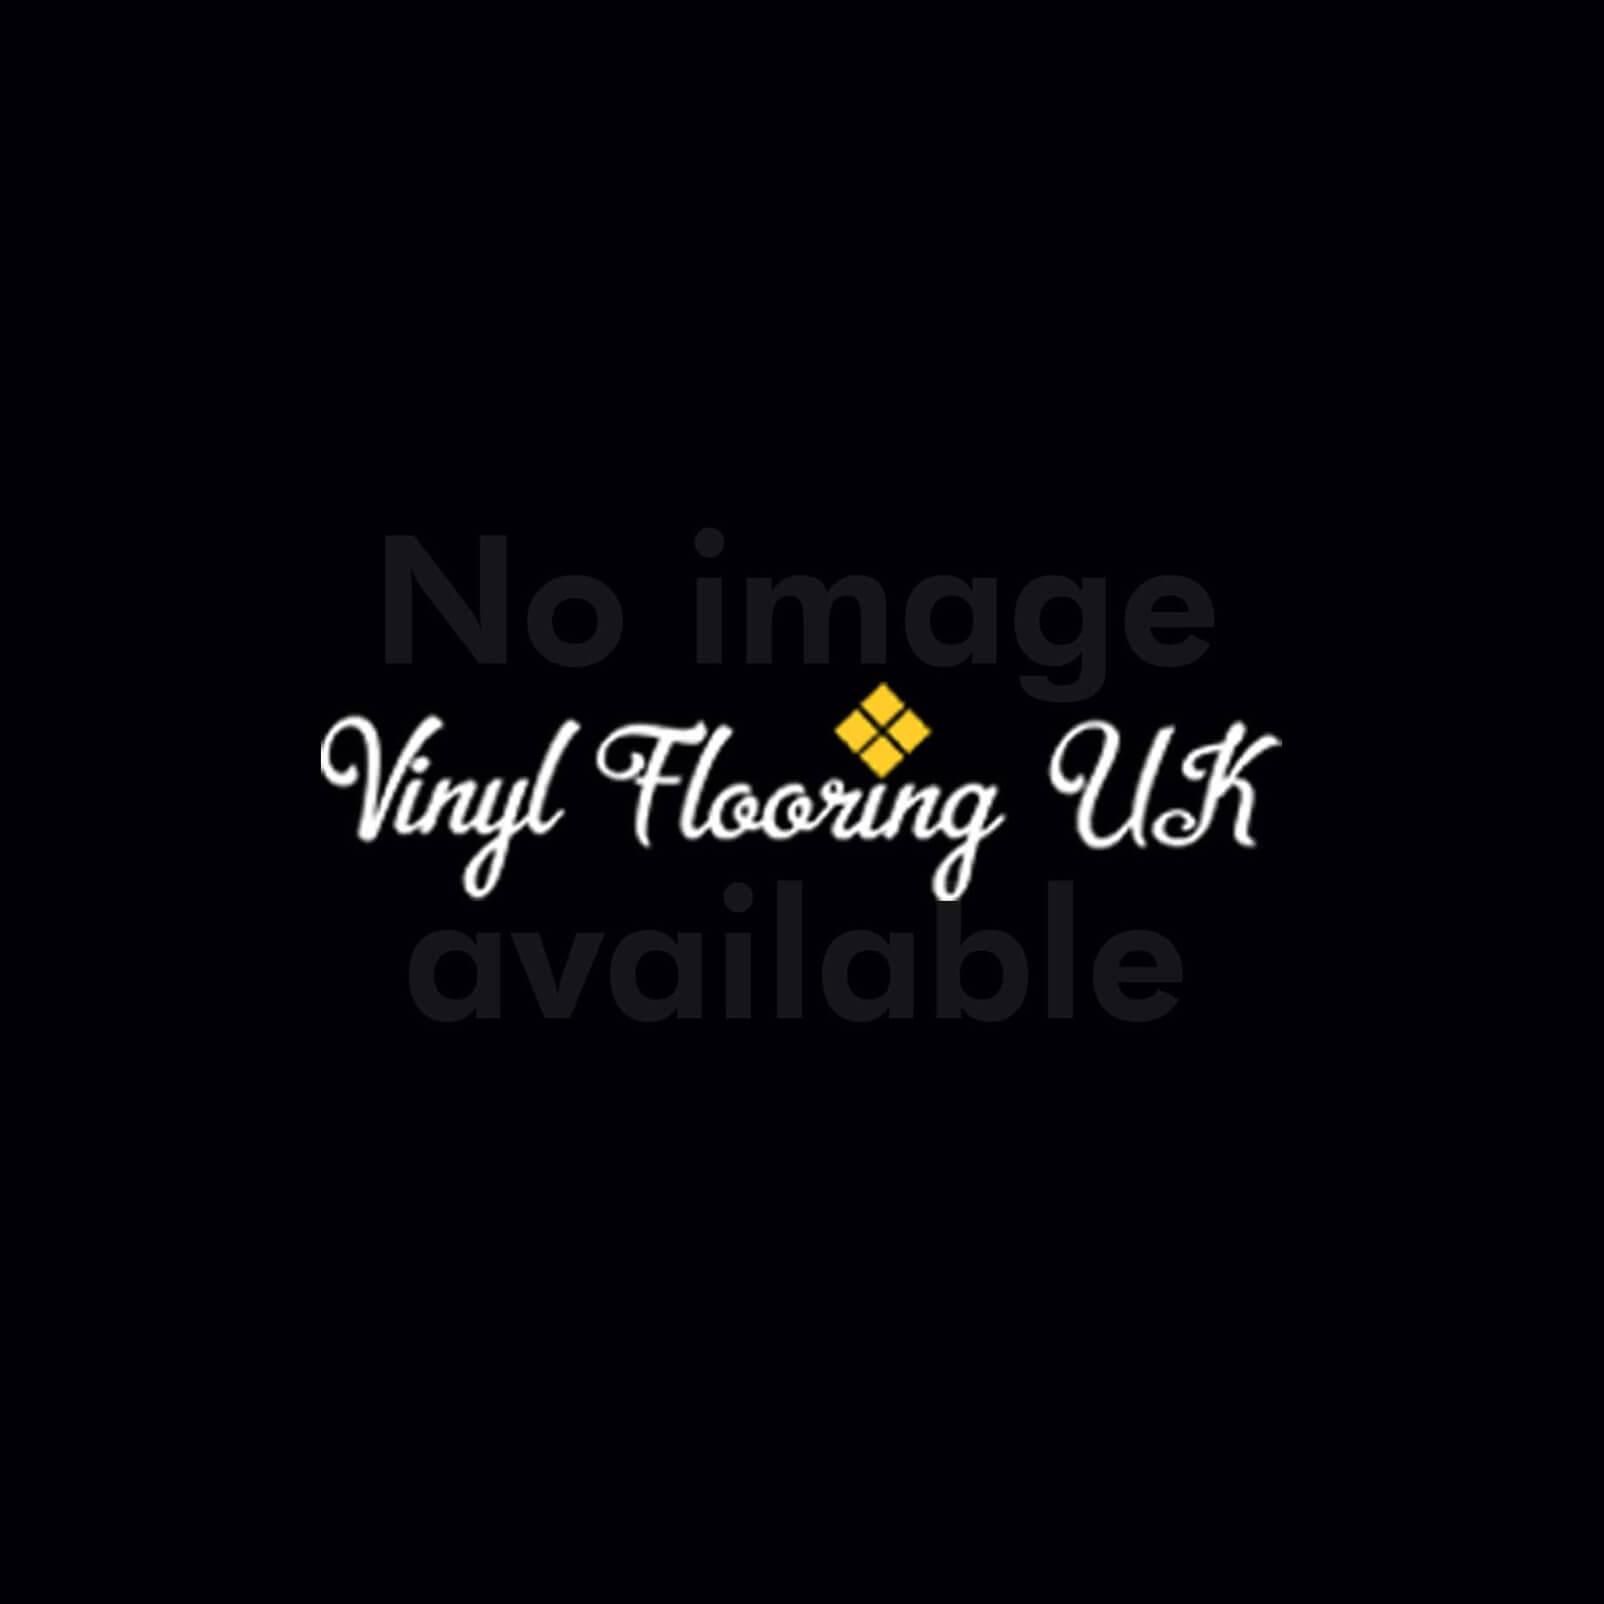 597 Speckled Effect Luxury Vinyl Flooring 3mX2.3m